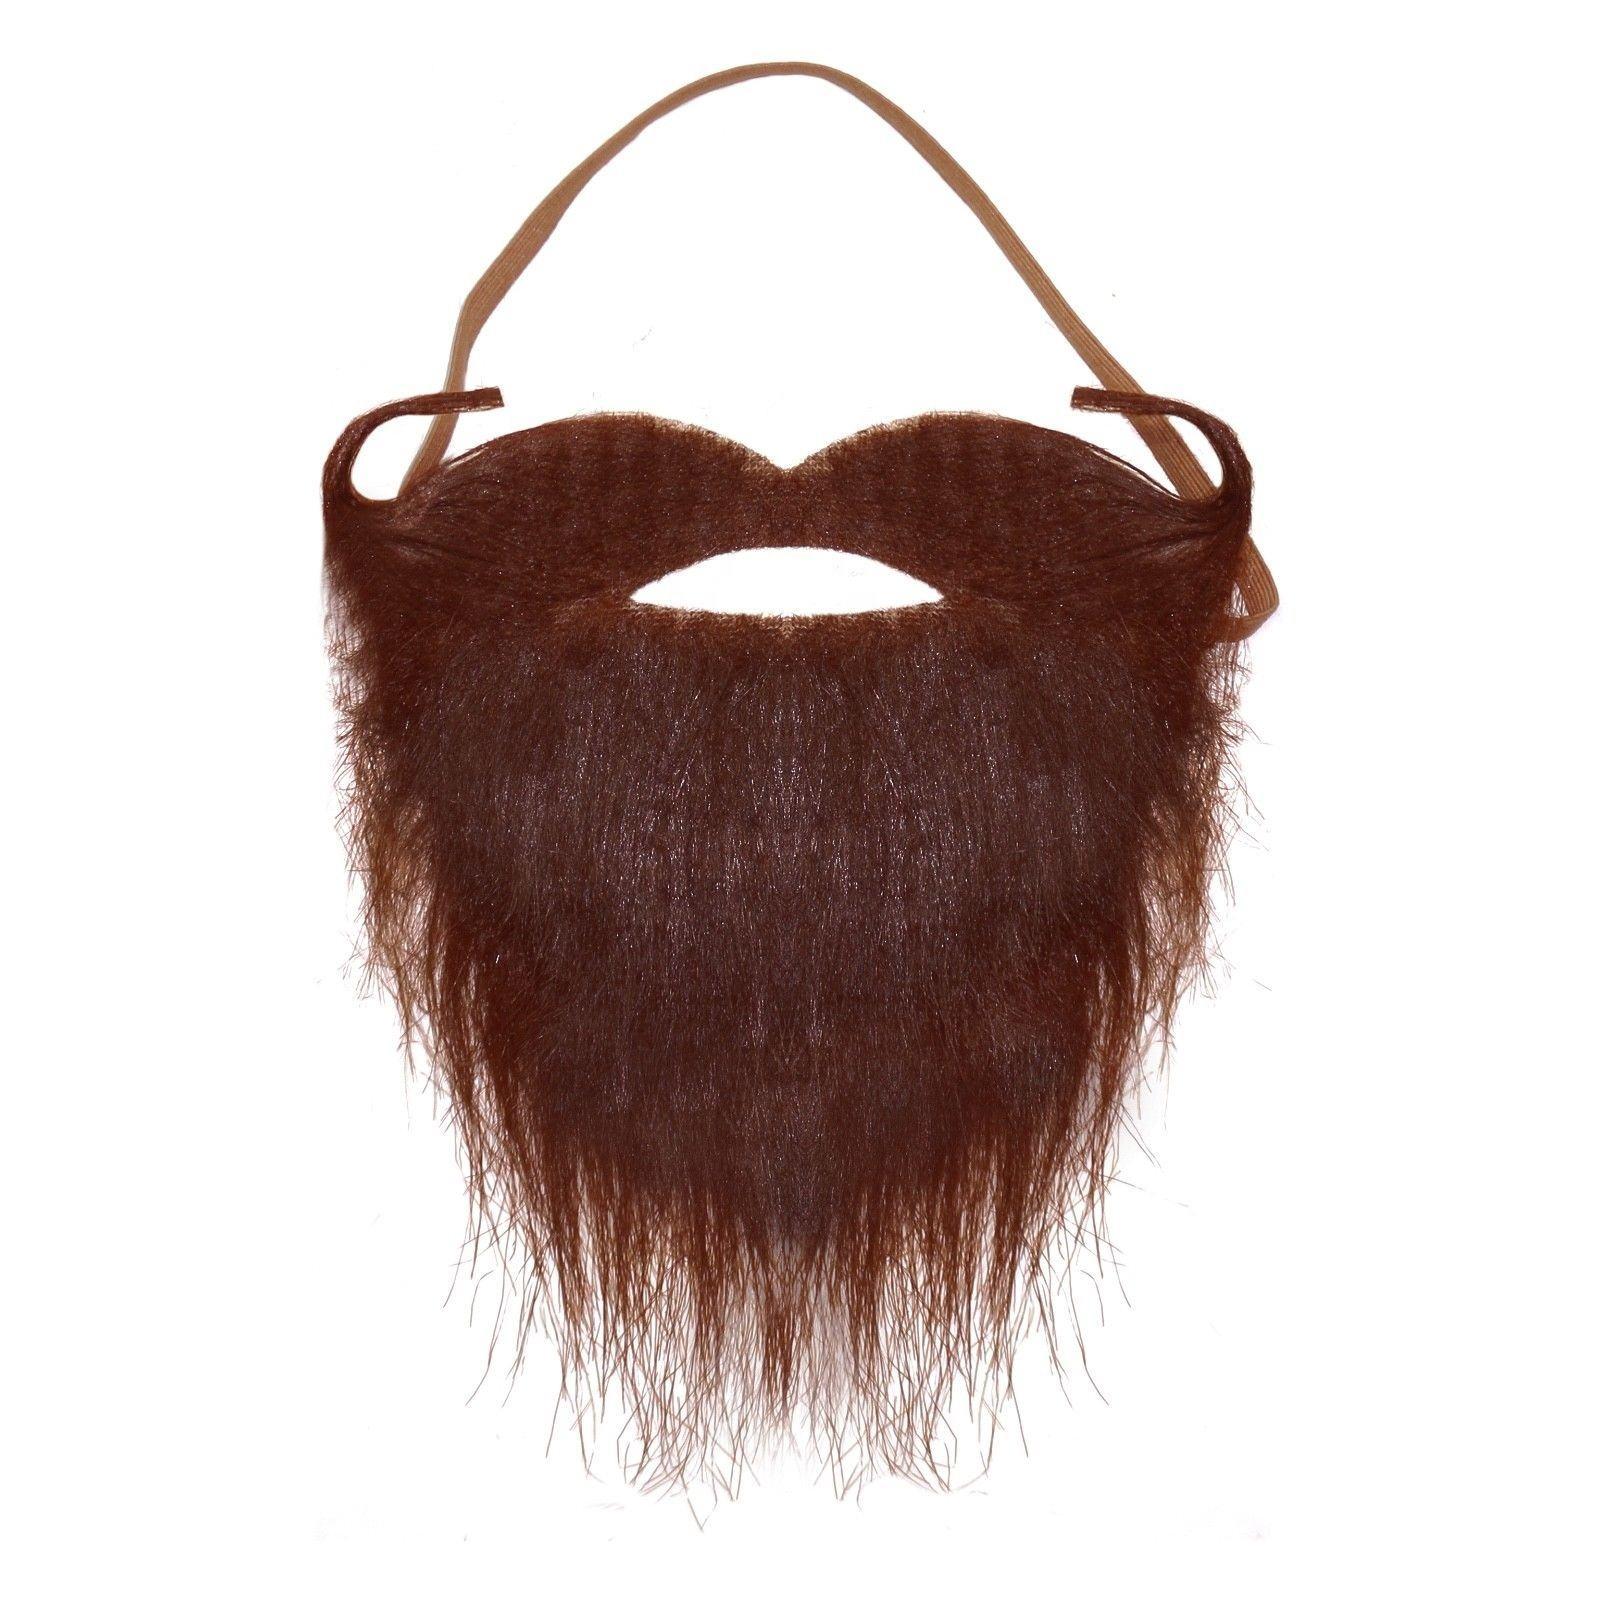 Stick on Fancy Dress Moustaches Tash Tashes Fake Moustache Mexican Lot Beard Hot